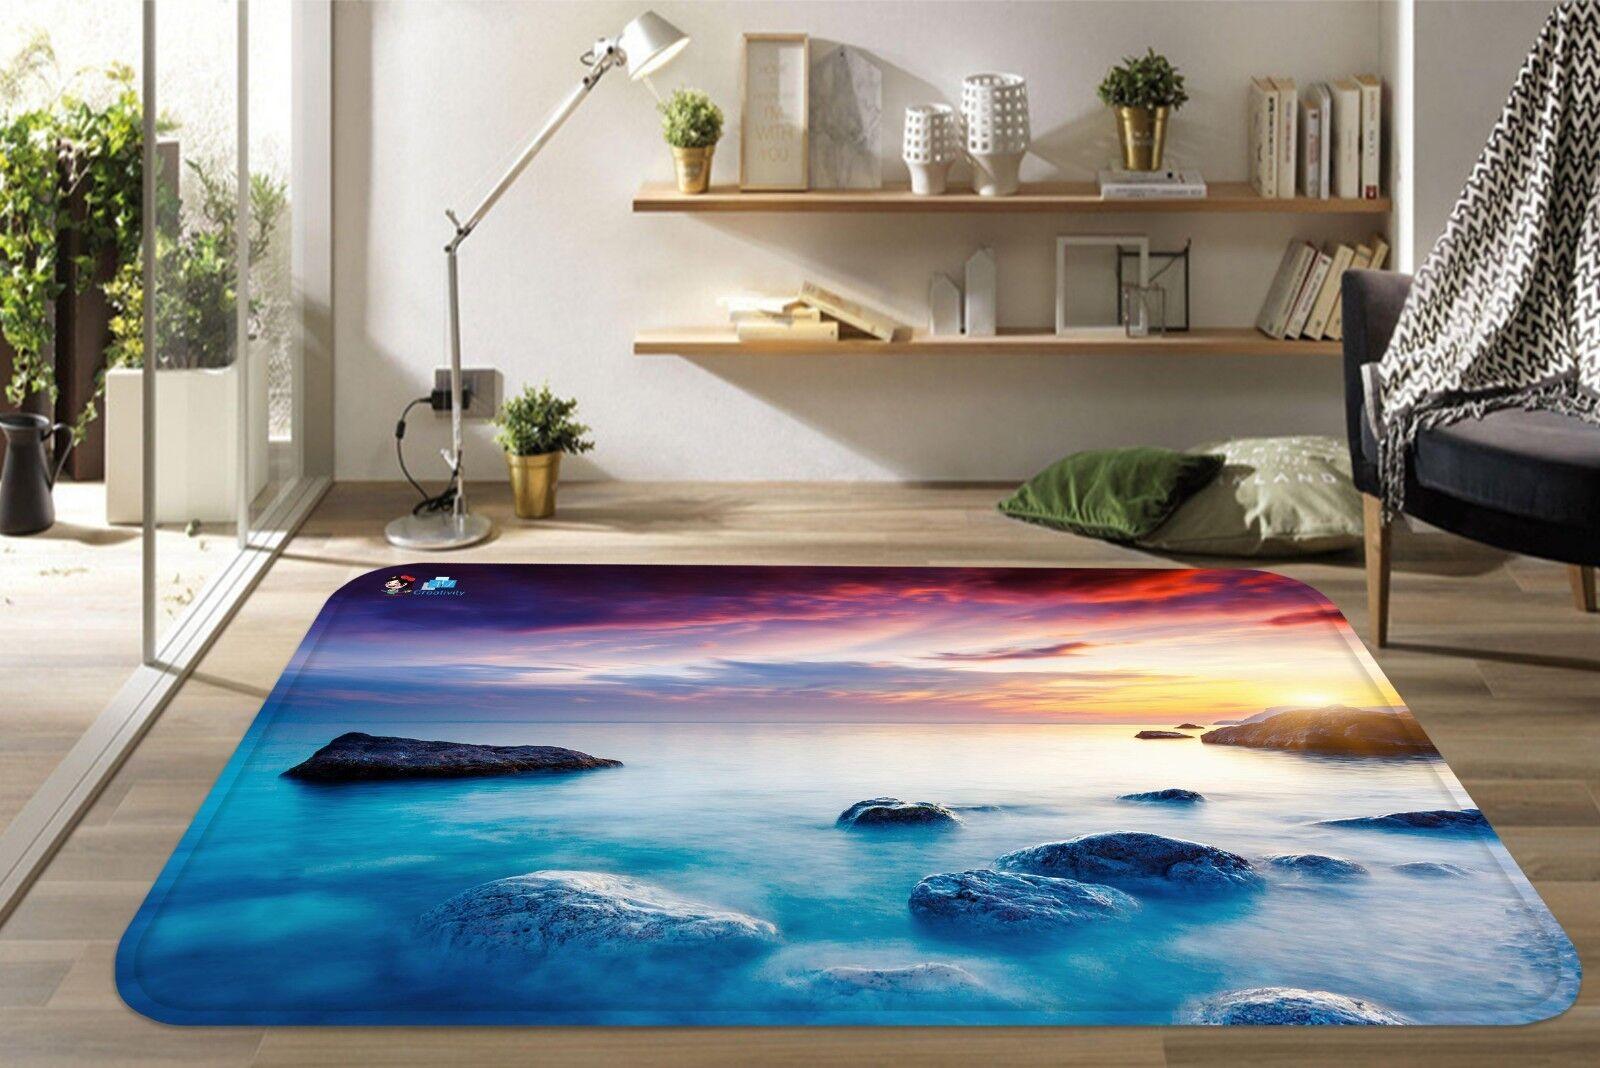 3d río piedras 049 non-slip Carpet mat quality elegante Carpet de Summer